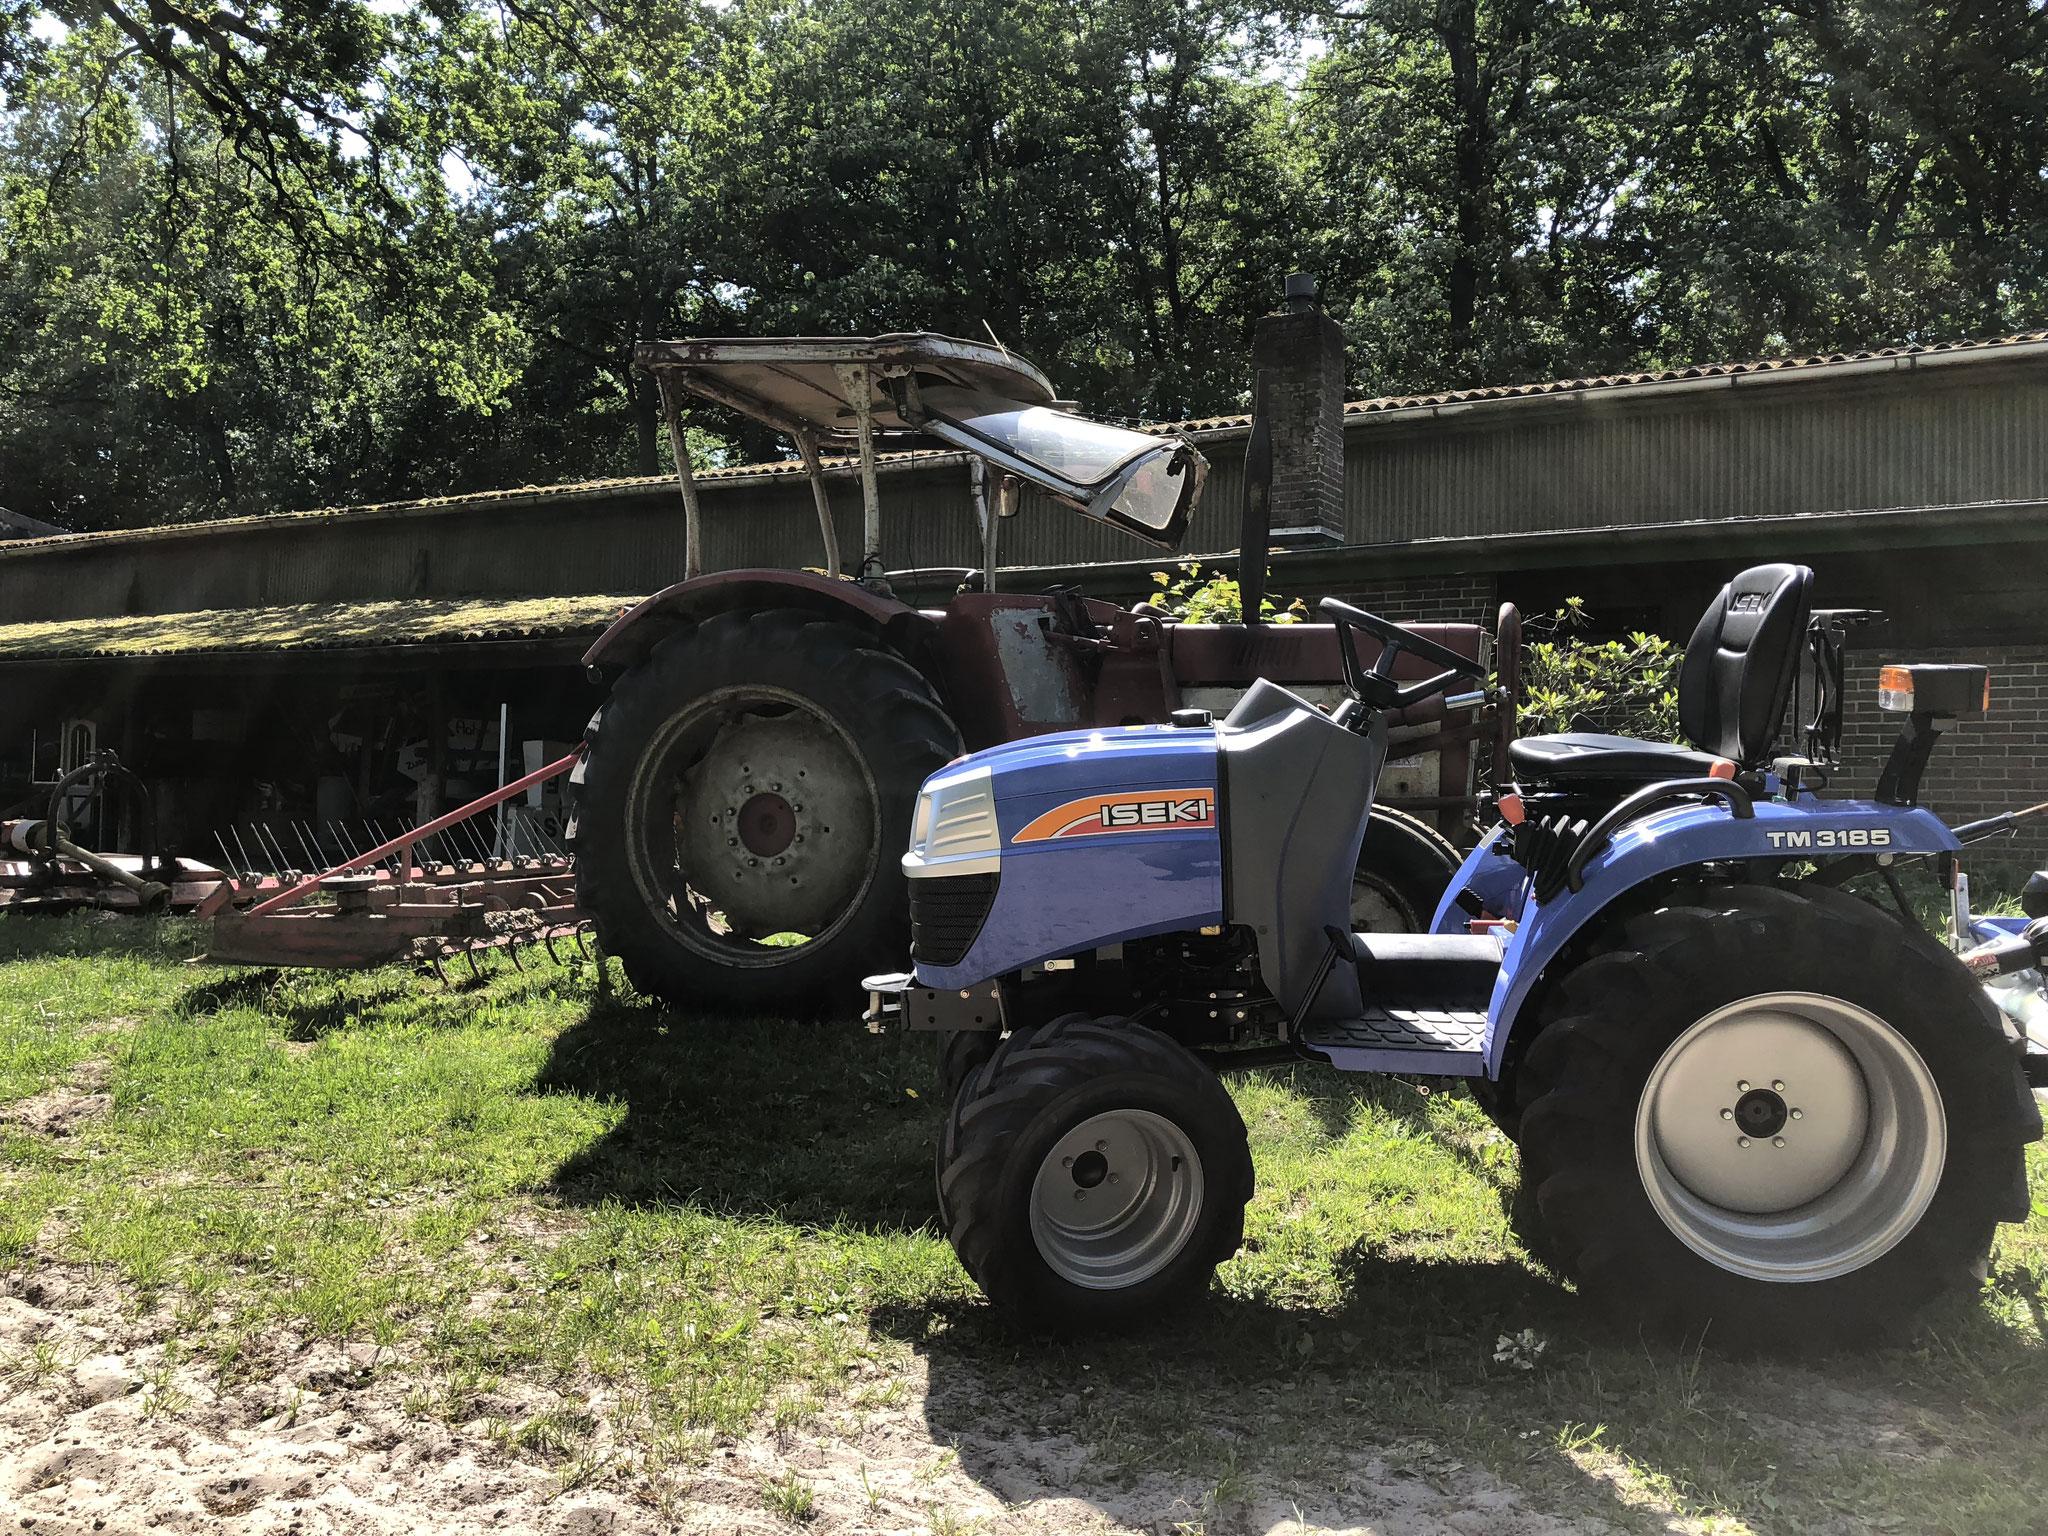 Iseki TM 3185 vs IHC Traktor